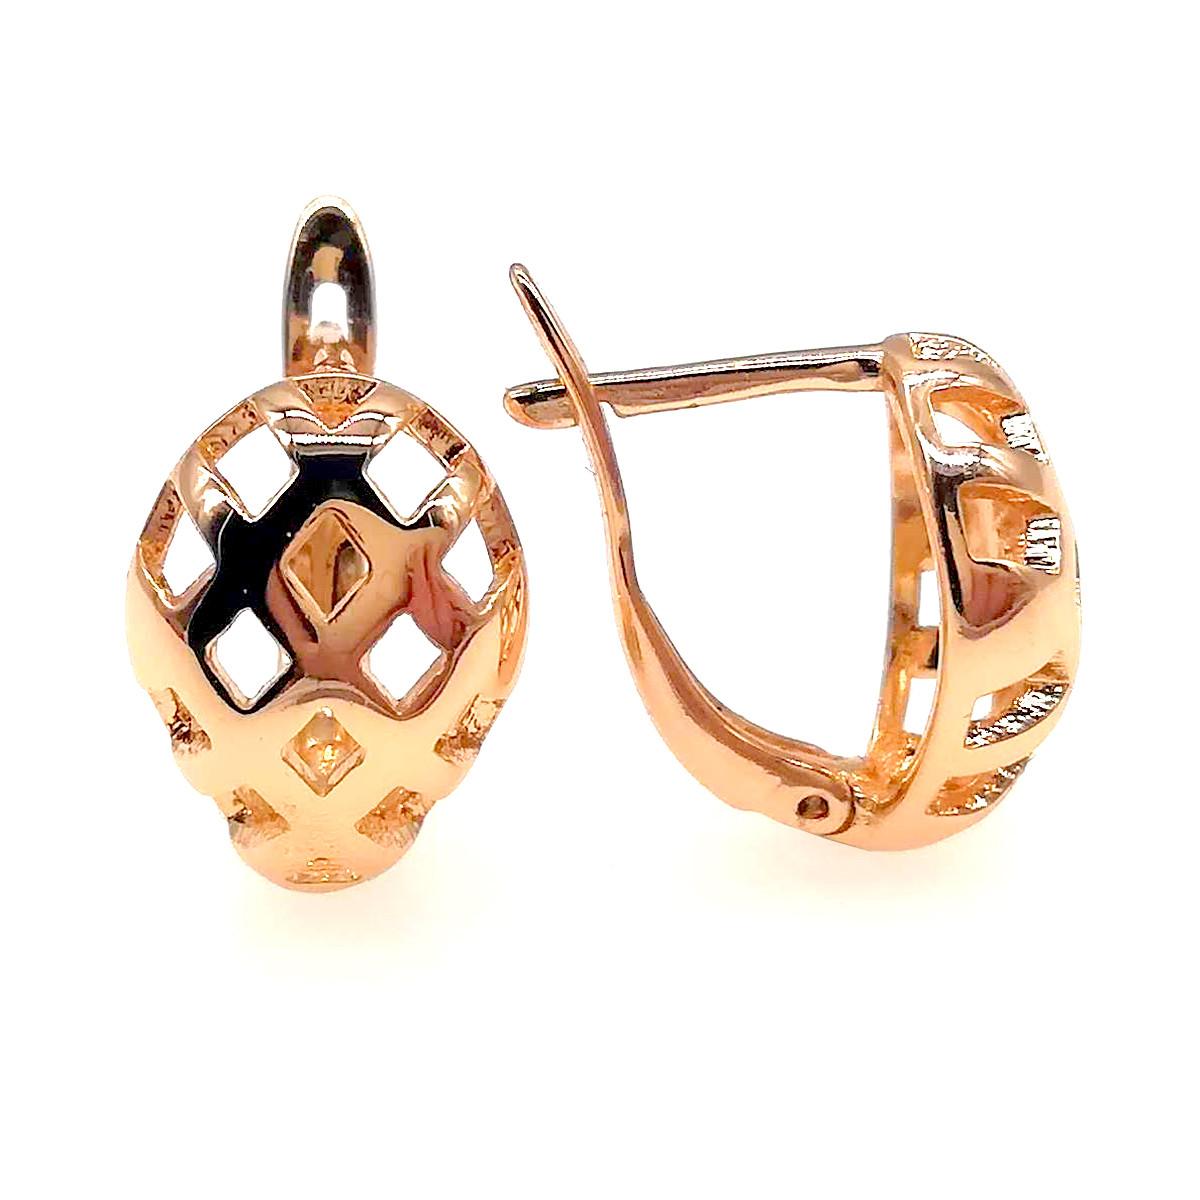 Сережки Xuping з медичного золота, в позолоті, ХР00292 (1)